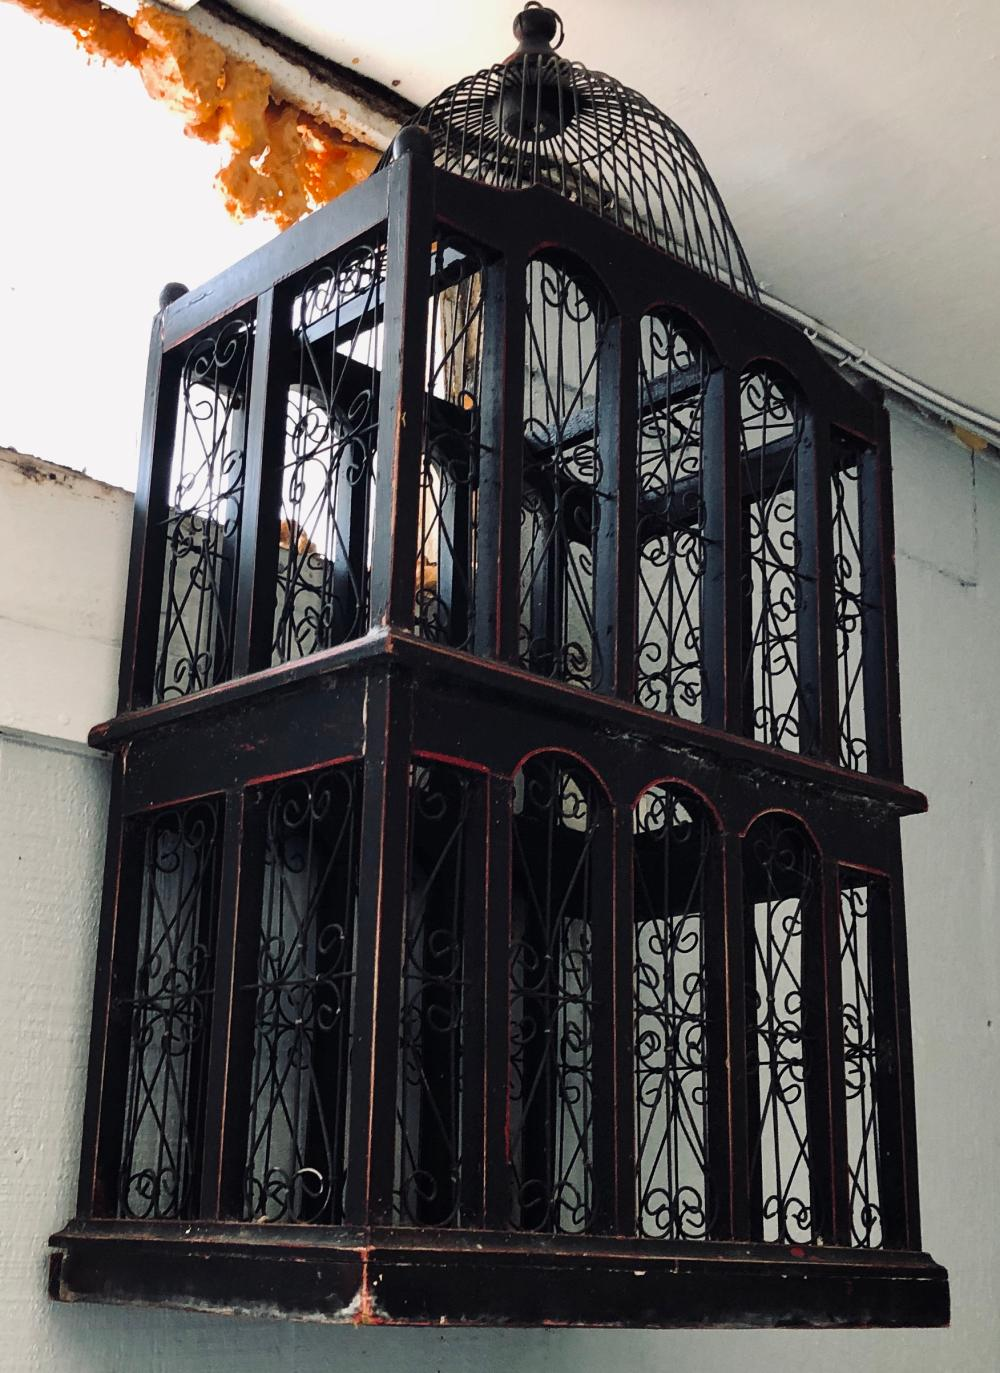 Lot 141: Birdcage